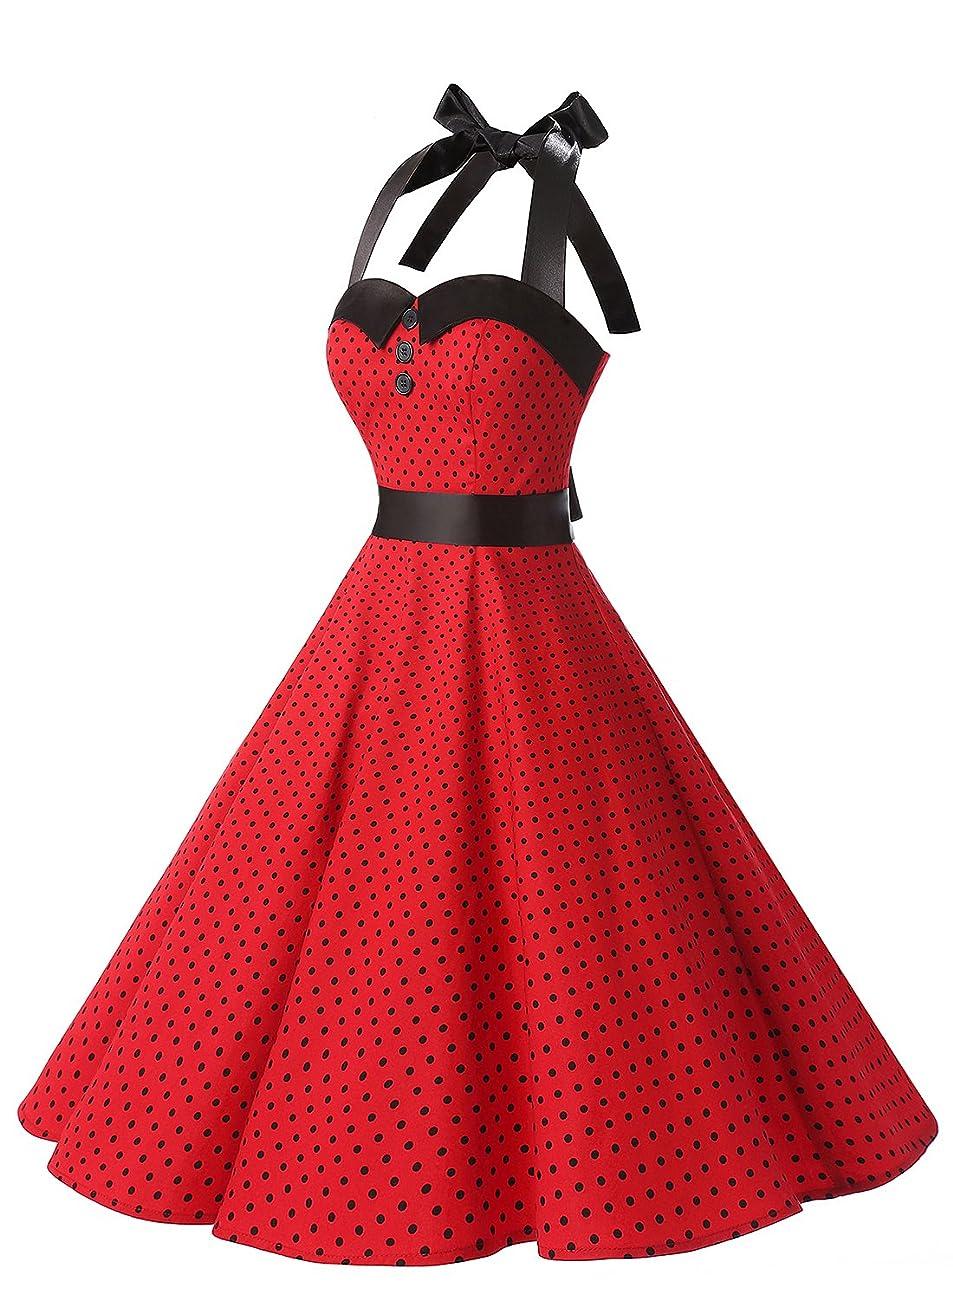 Dressystar Vintage Polka Dot Retro Cocktail Prom Dresses 50's 60's Rockabilly Bandage 1